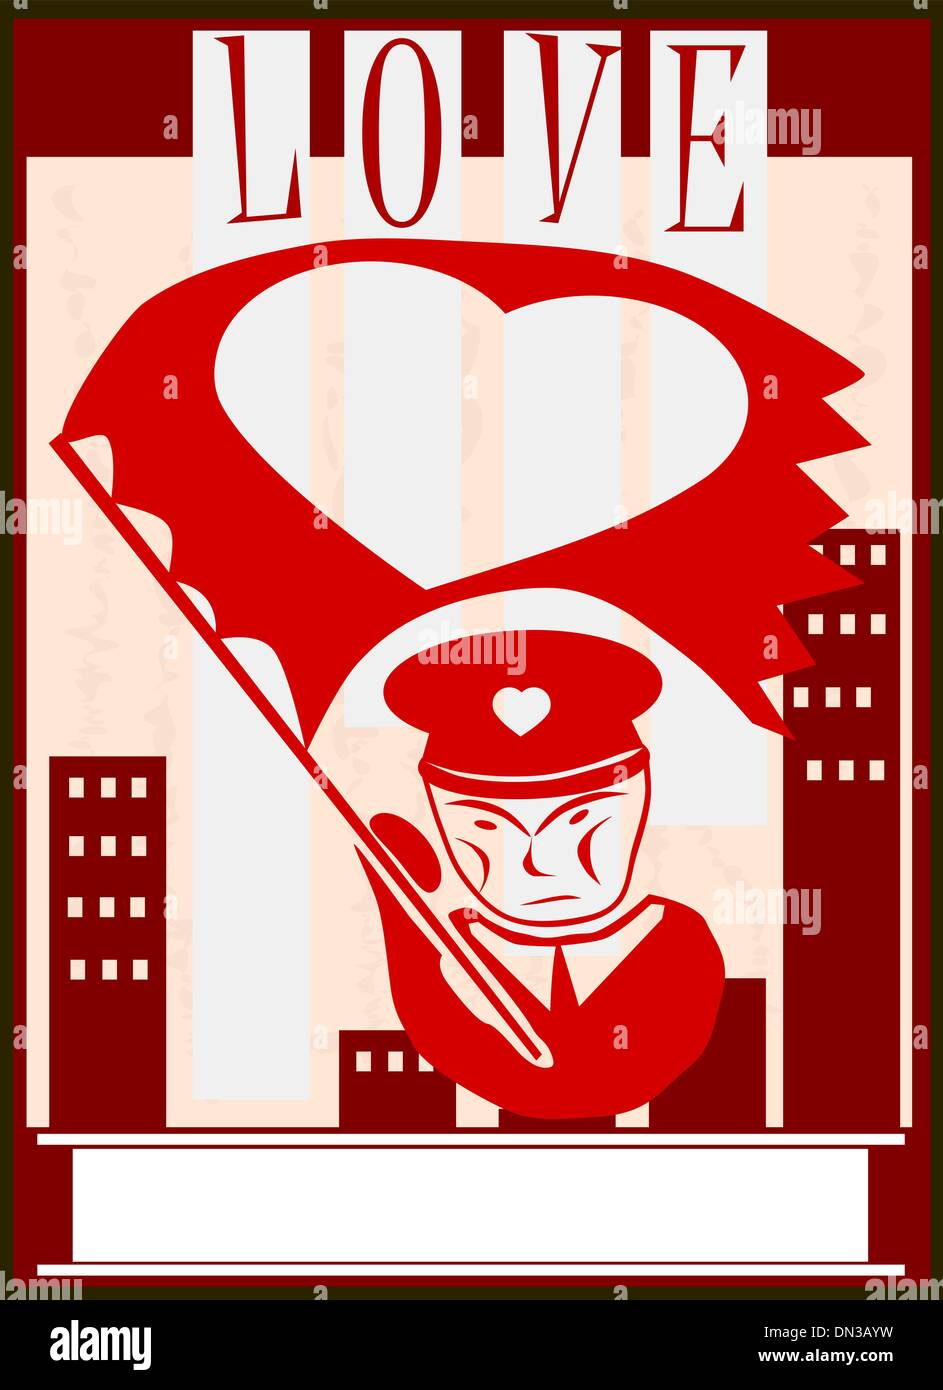 Love propaganda - Stock Vector